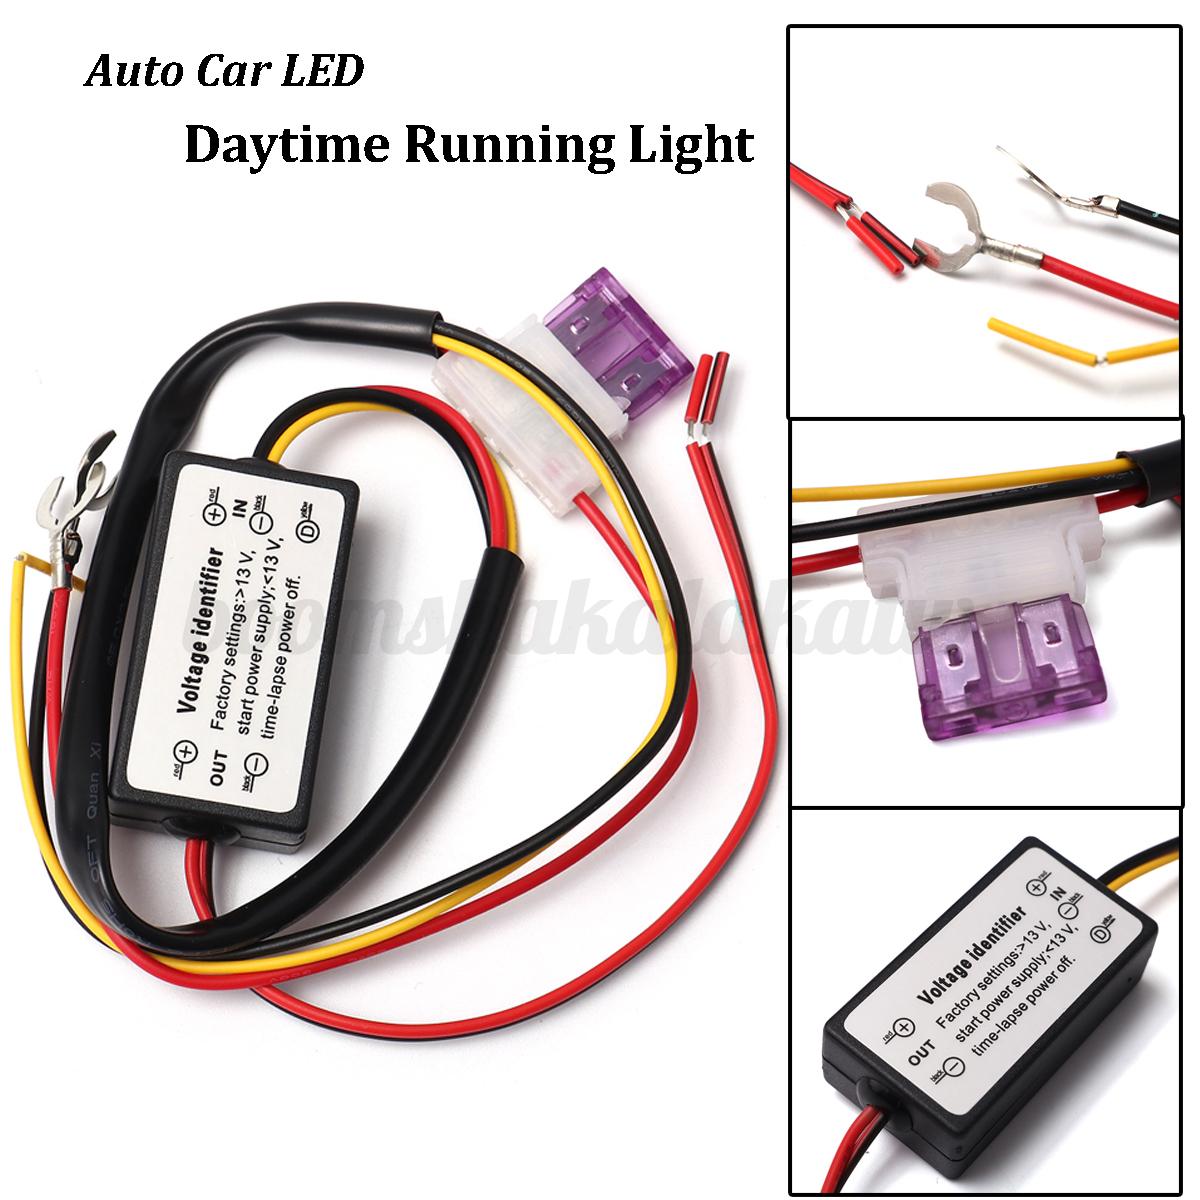 Image is loading 12v car auto led daytime running light drl